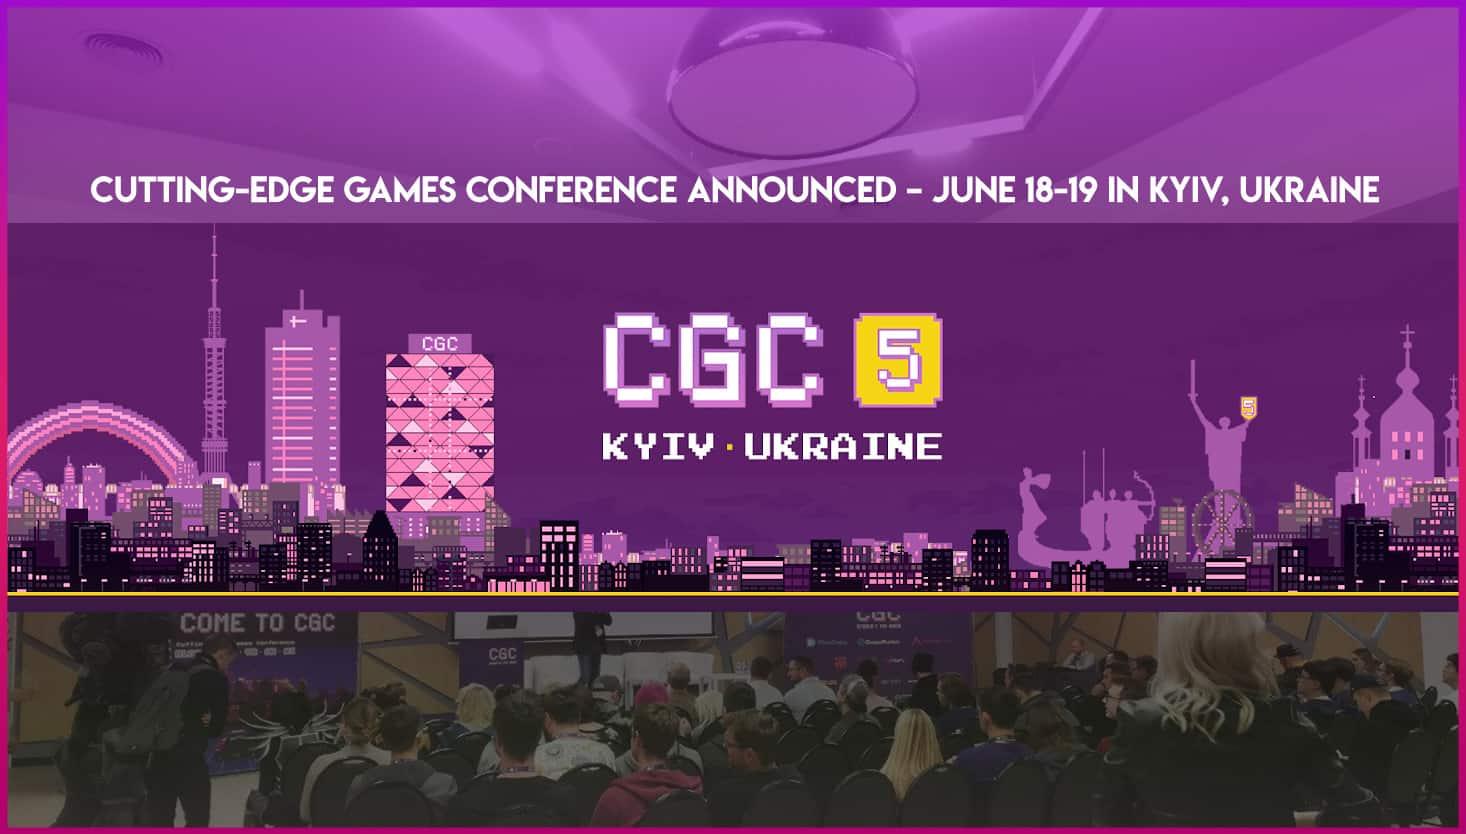 CGC Cutting-edge conference